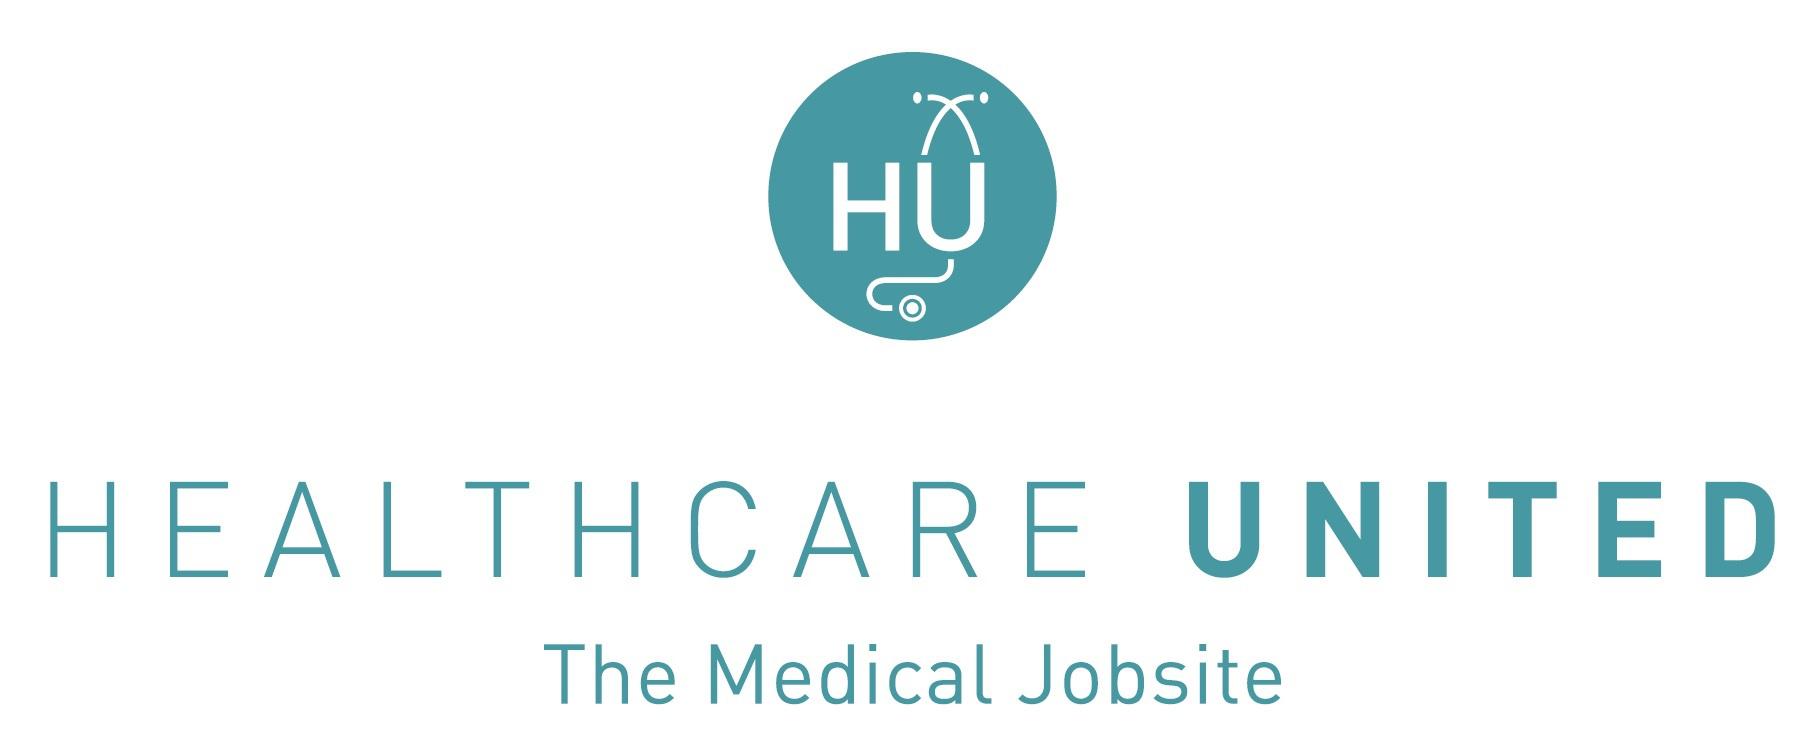 HU HEALTHCARE UNITED The Medical Jobsite